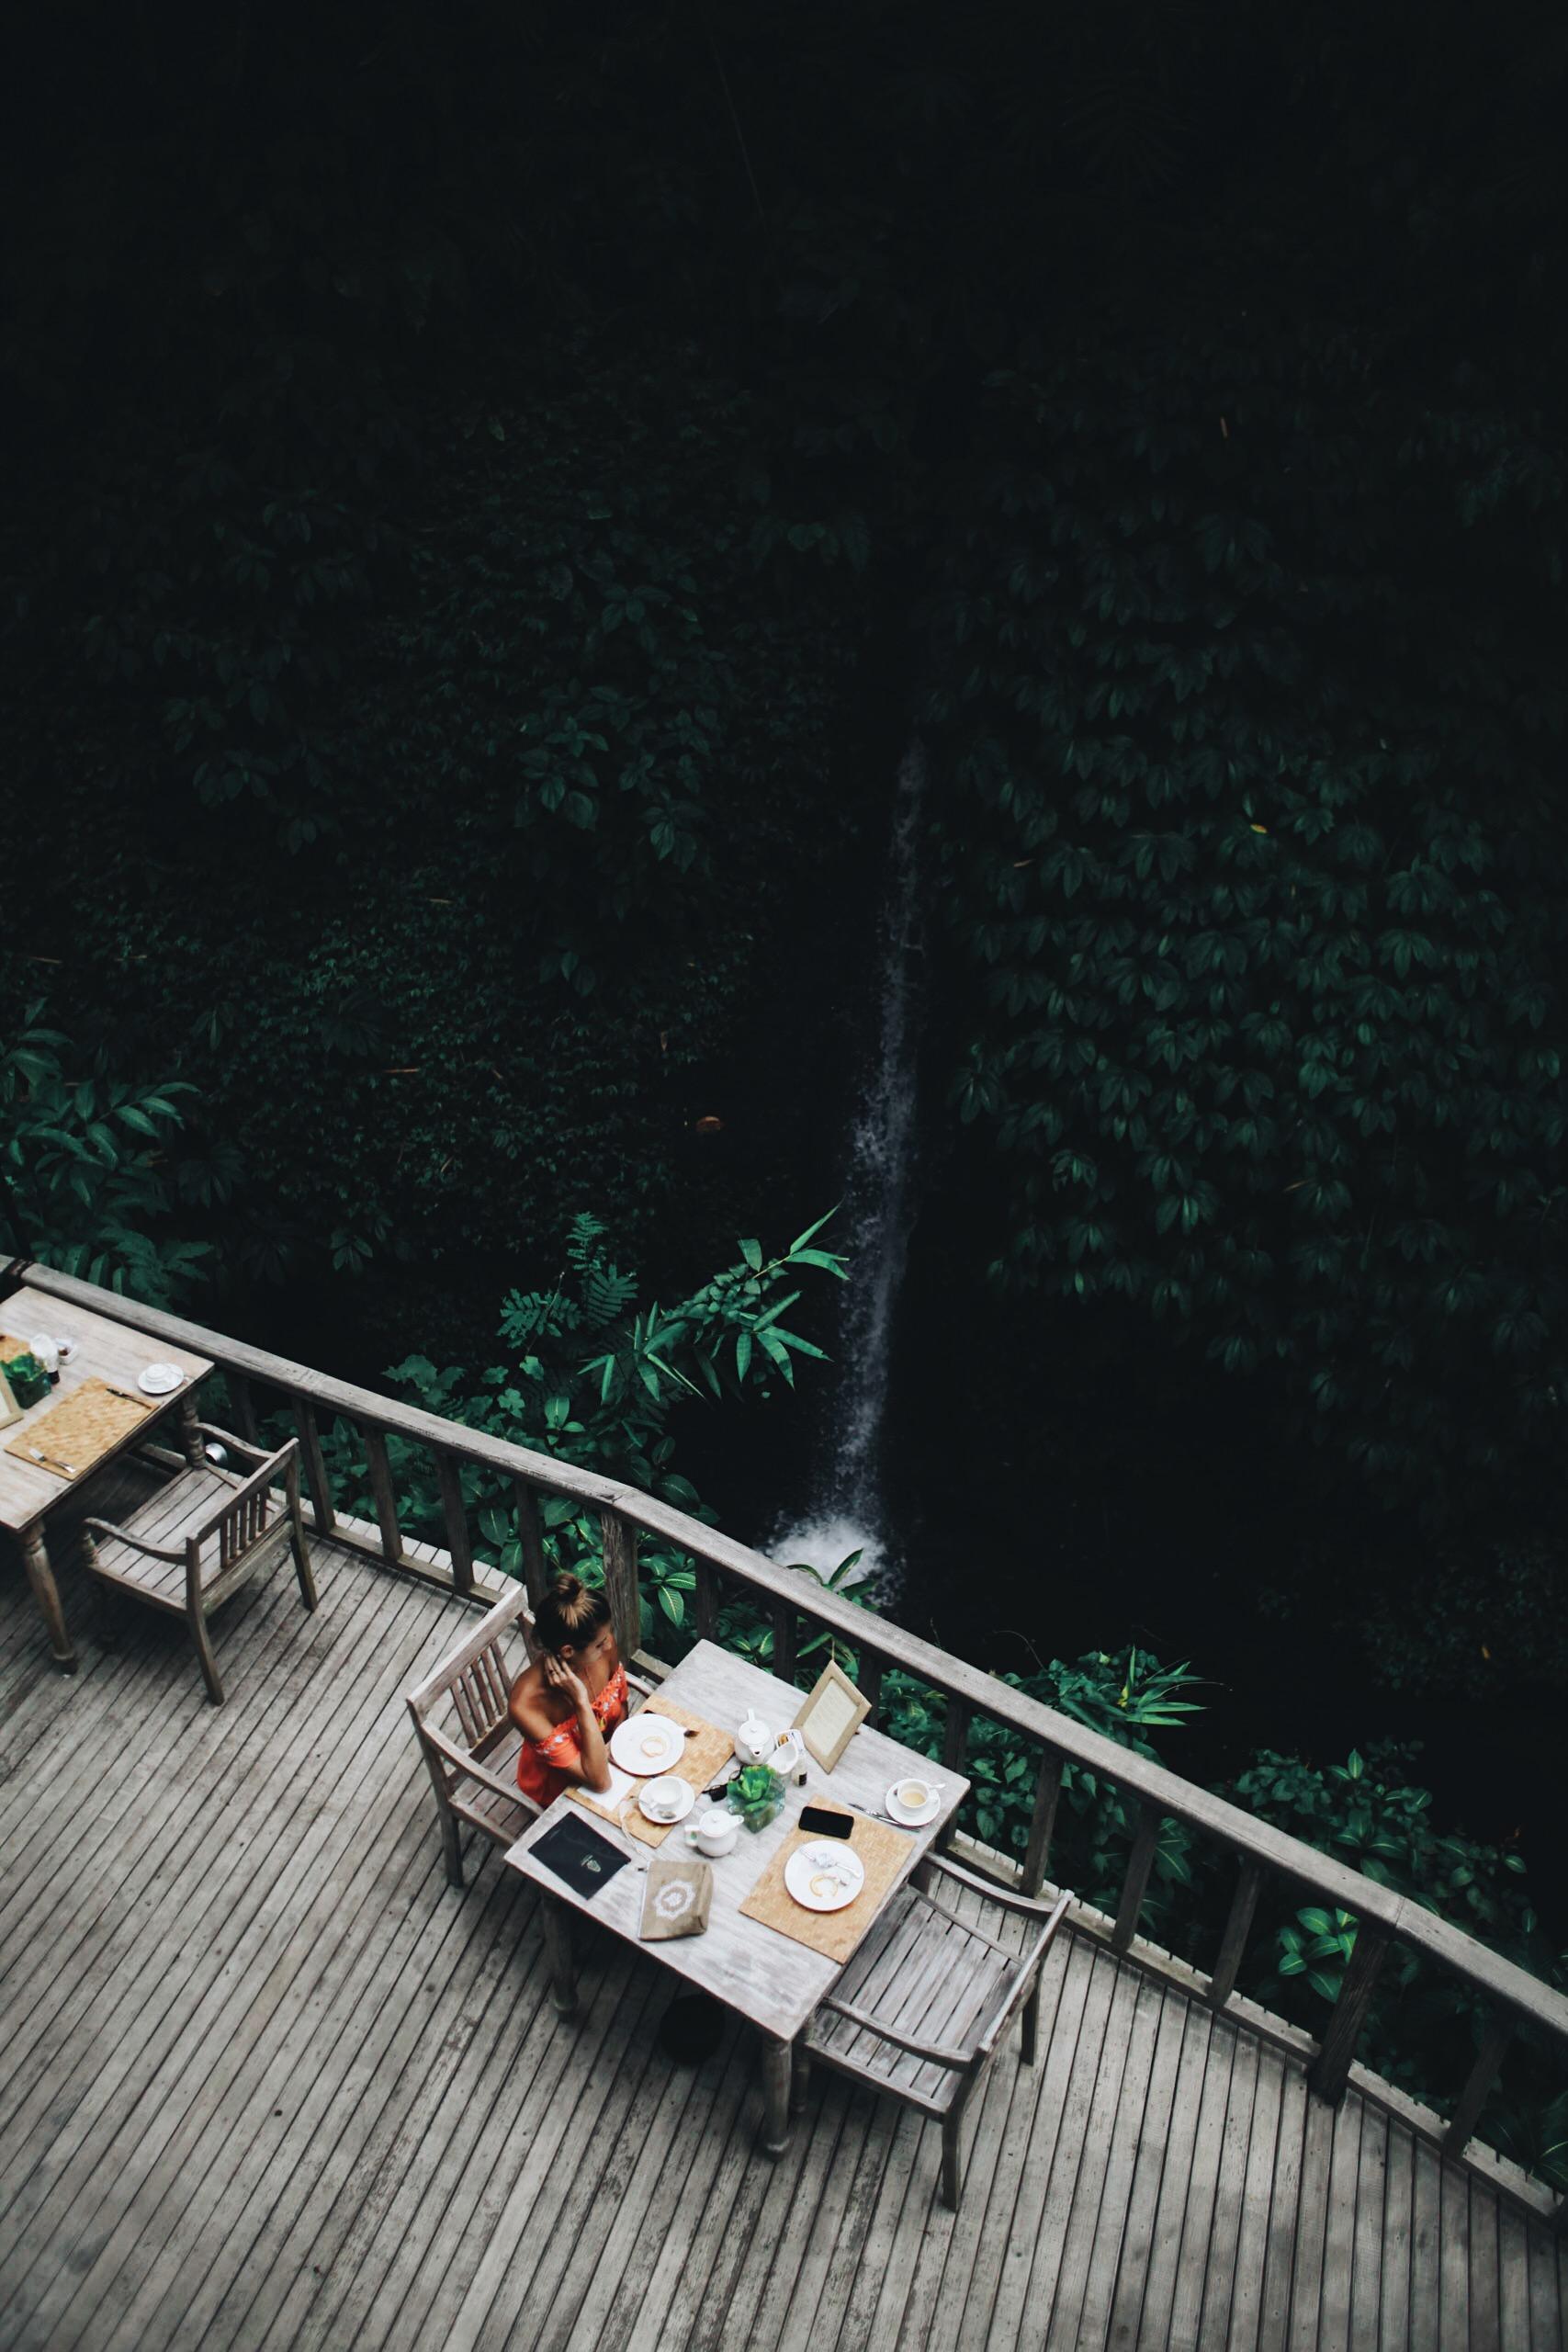 Ghania-iratni-photographe-bordeaux-travel-bali-indonesie-